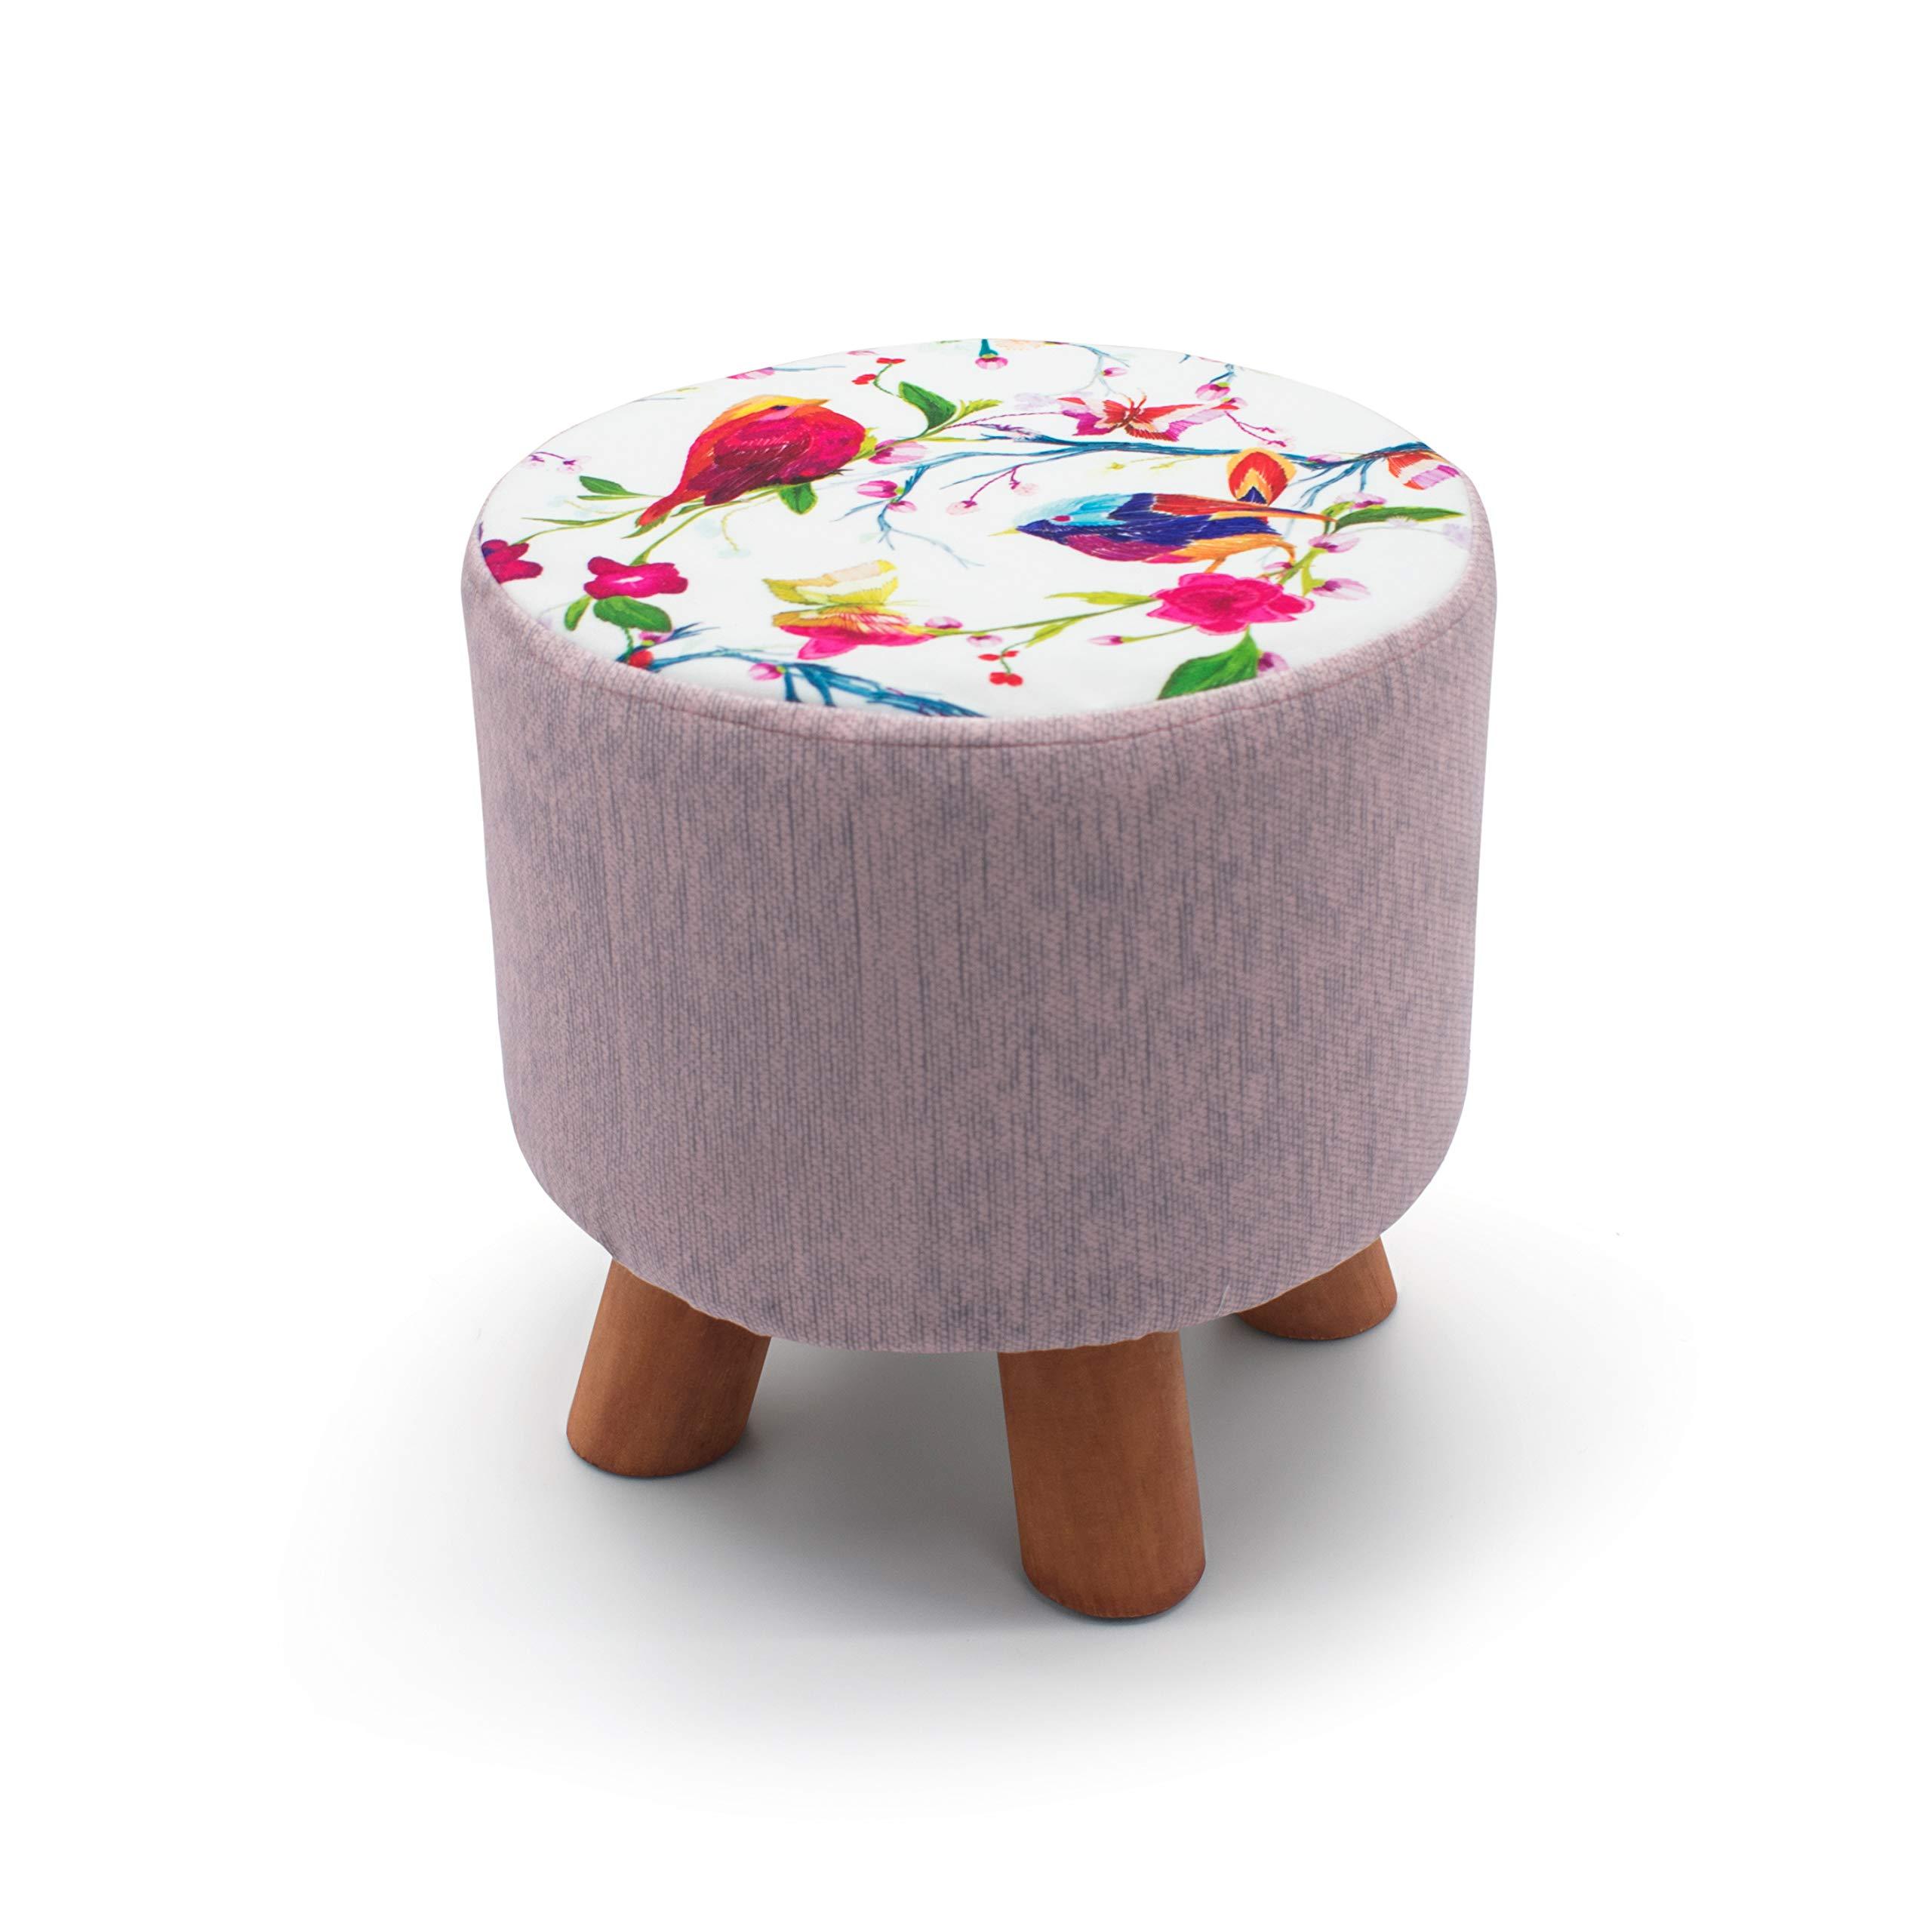 Large 2 Seater Crushed Velvet Fabric with Diamantes Foldaway Ottoman Stool Blanket Box Bench 76cms x 38cms Blush Pink